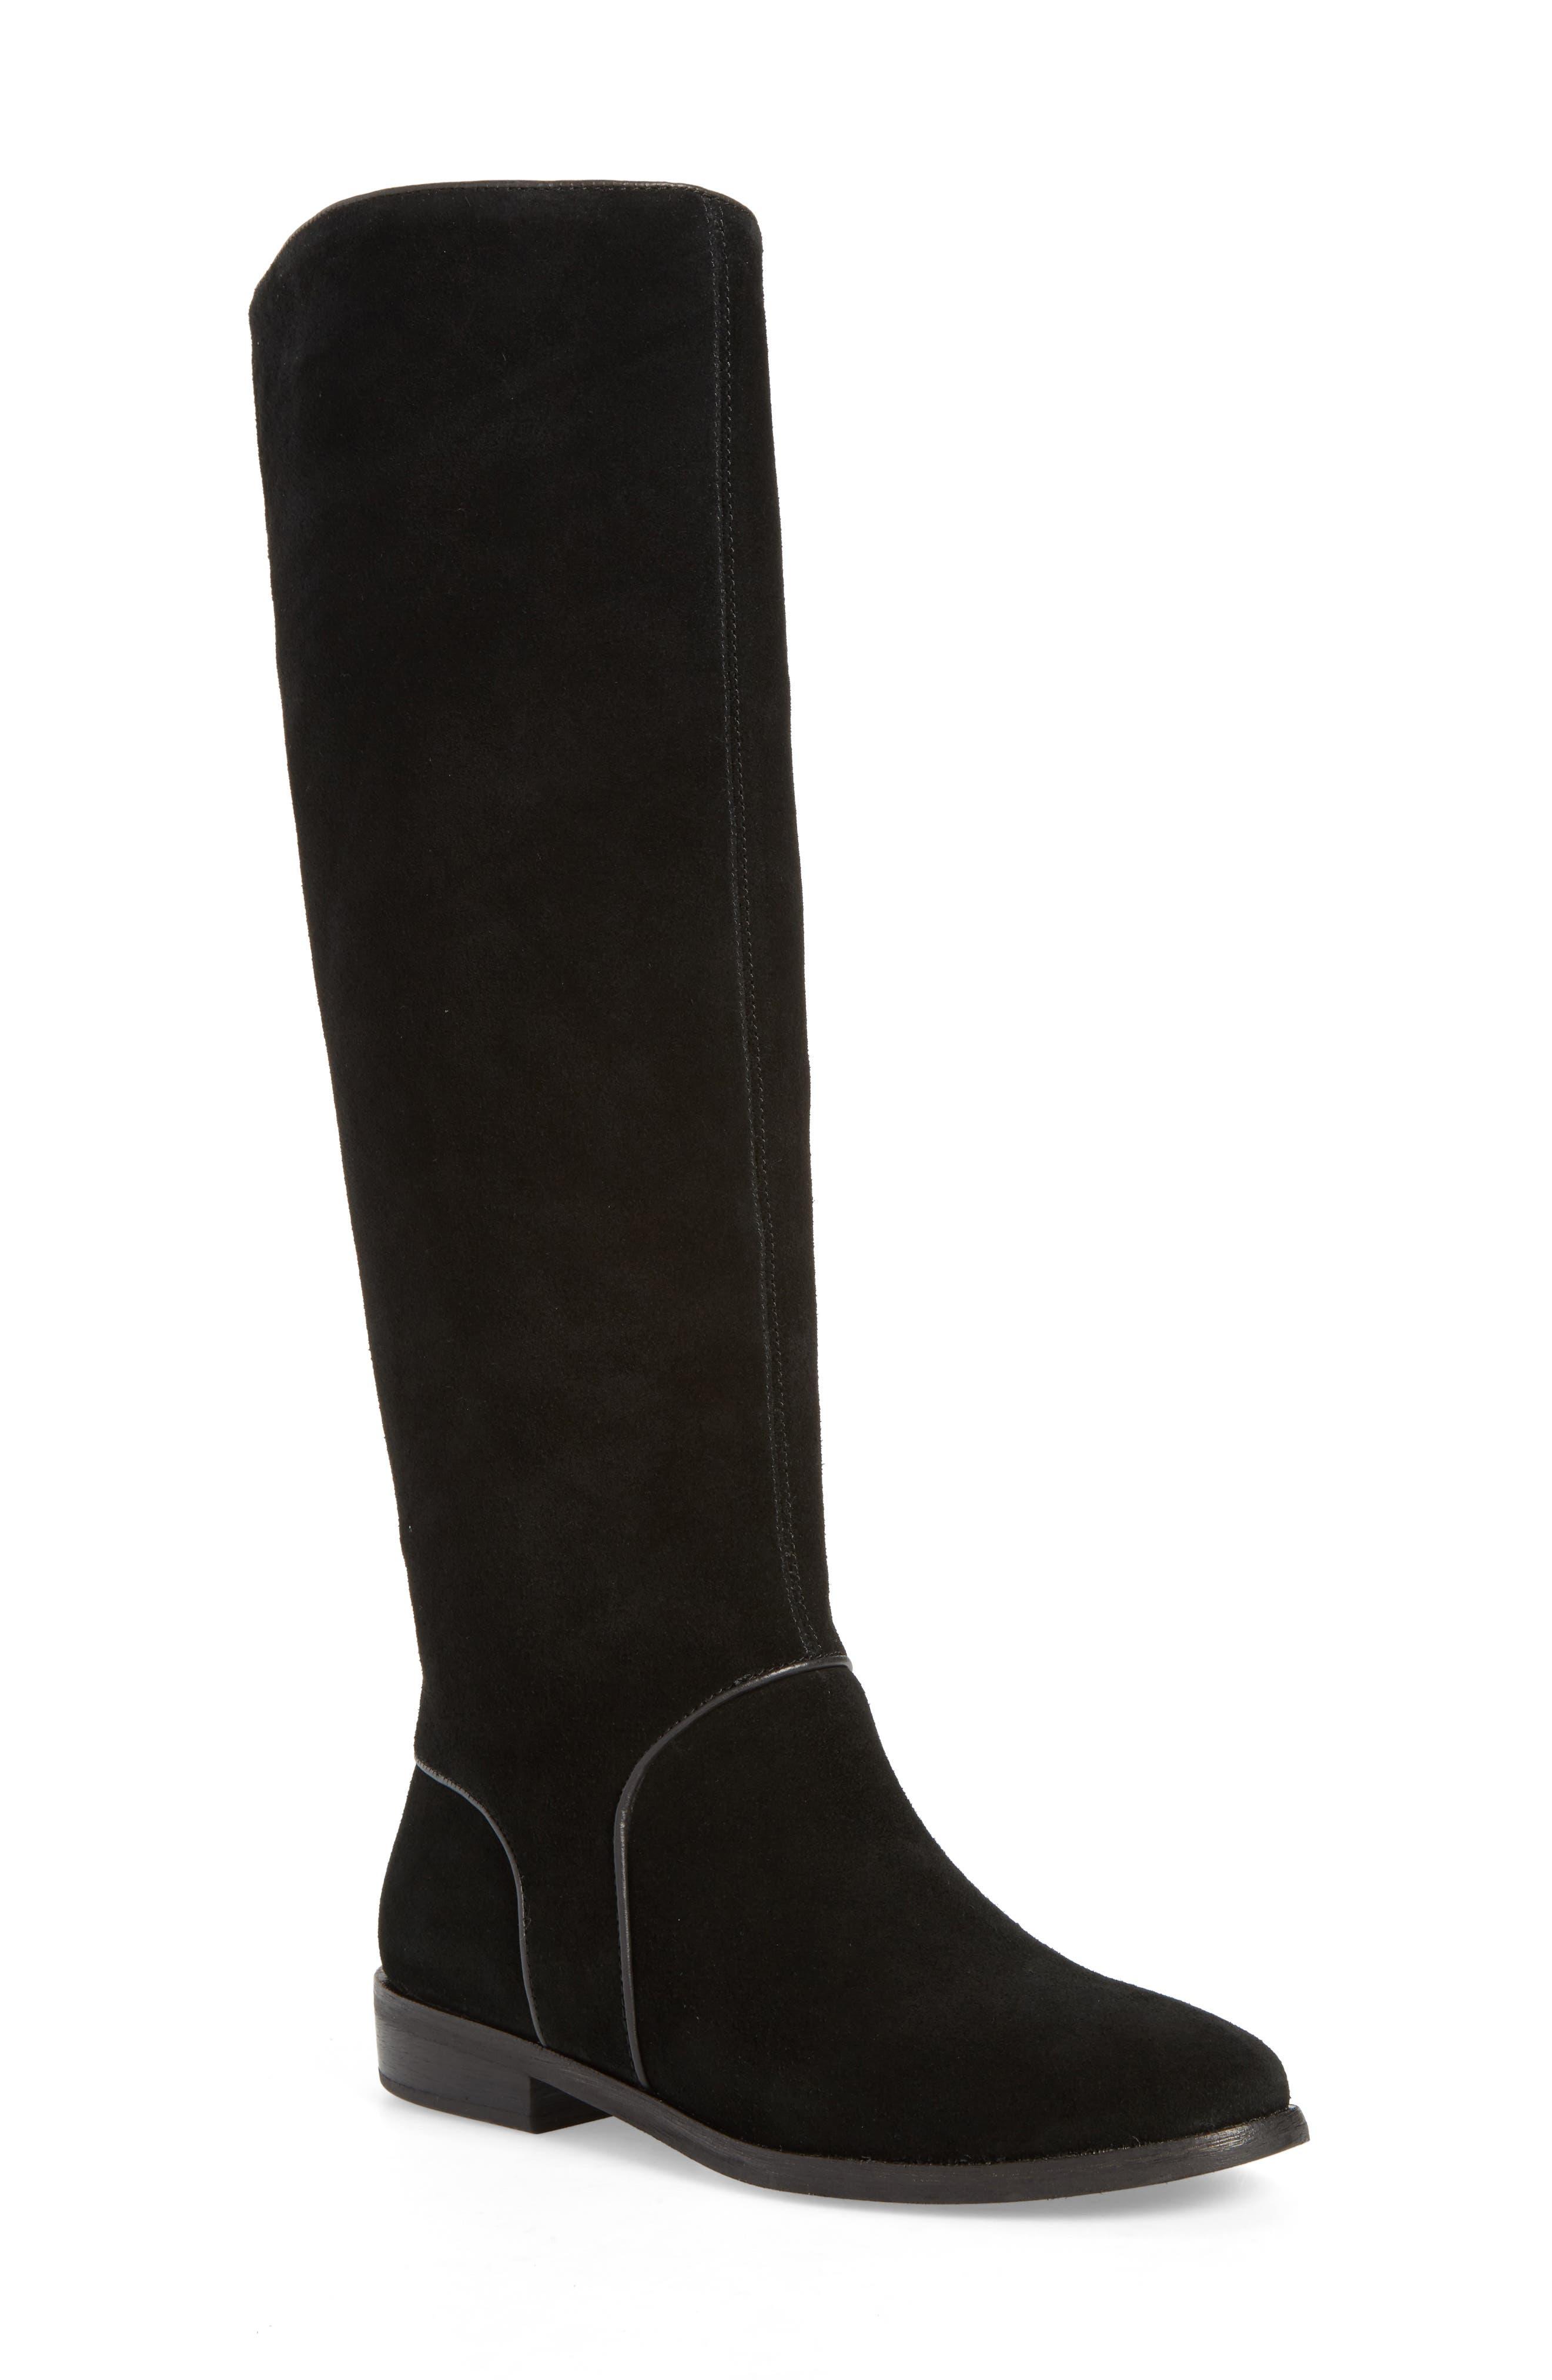 Gracen Knee High Boot,                             Main thumbnail 1, color,                             001